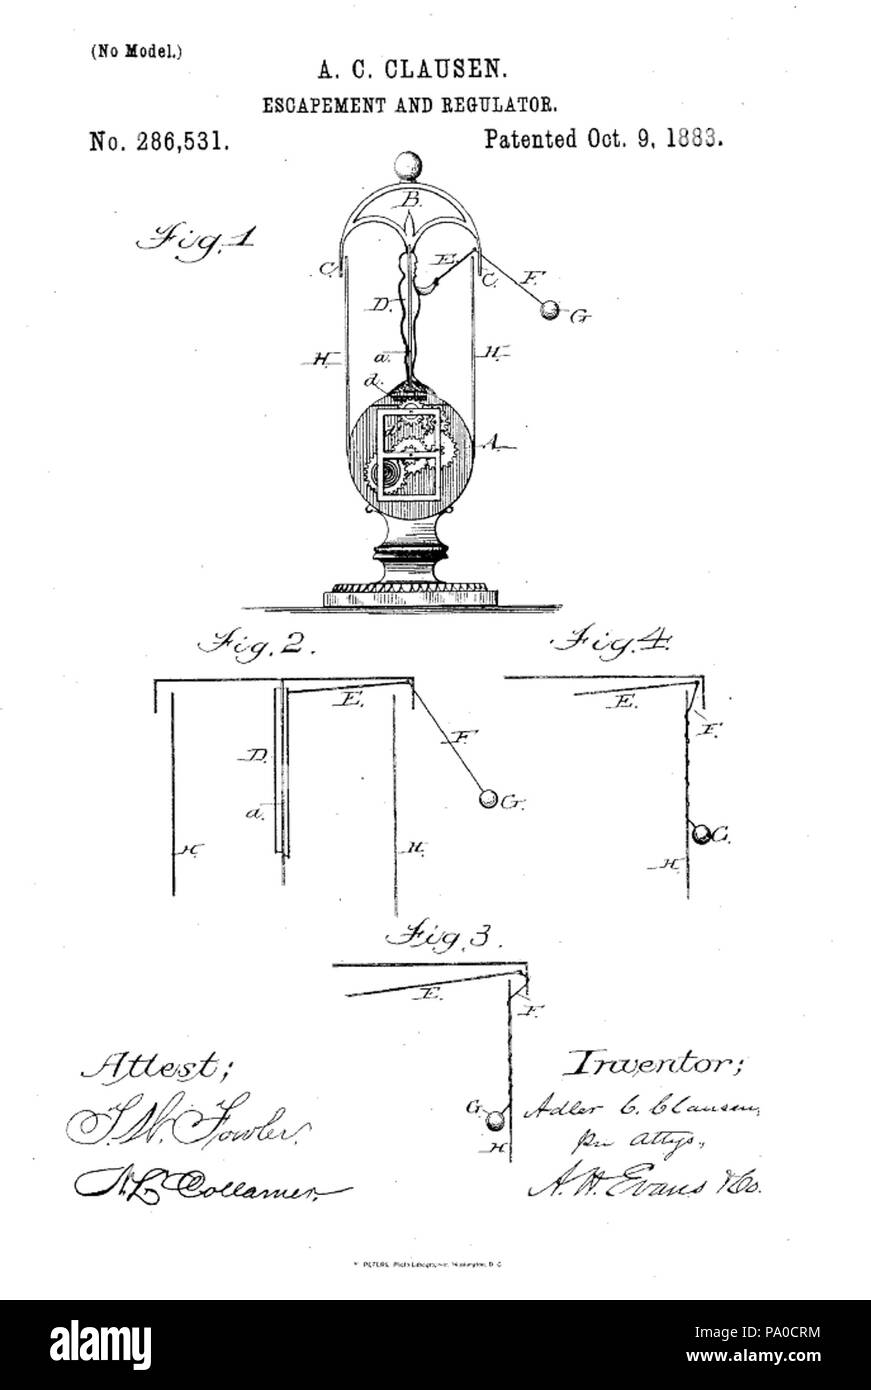 659 Flying pendulum clock Patent Stock Photo: 212681048 - Alamy